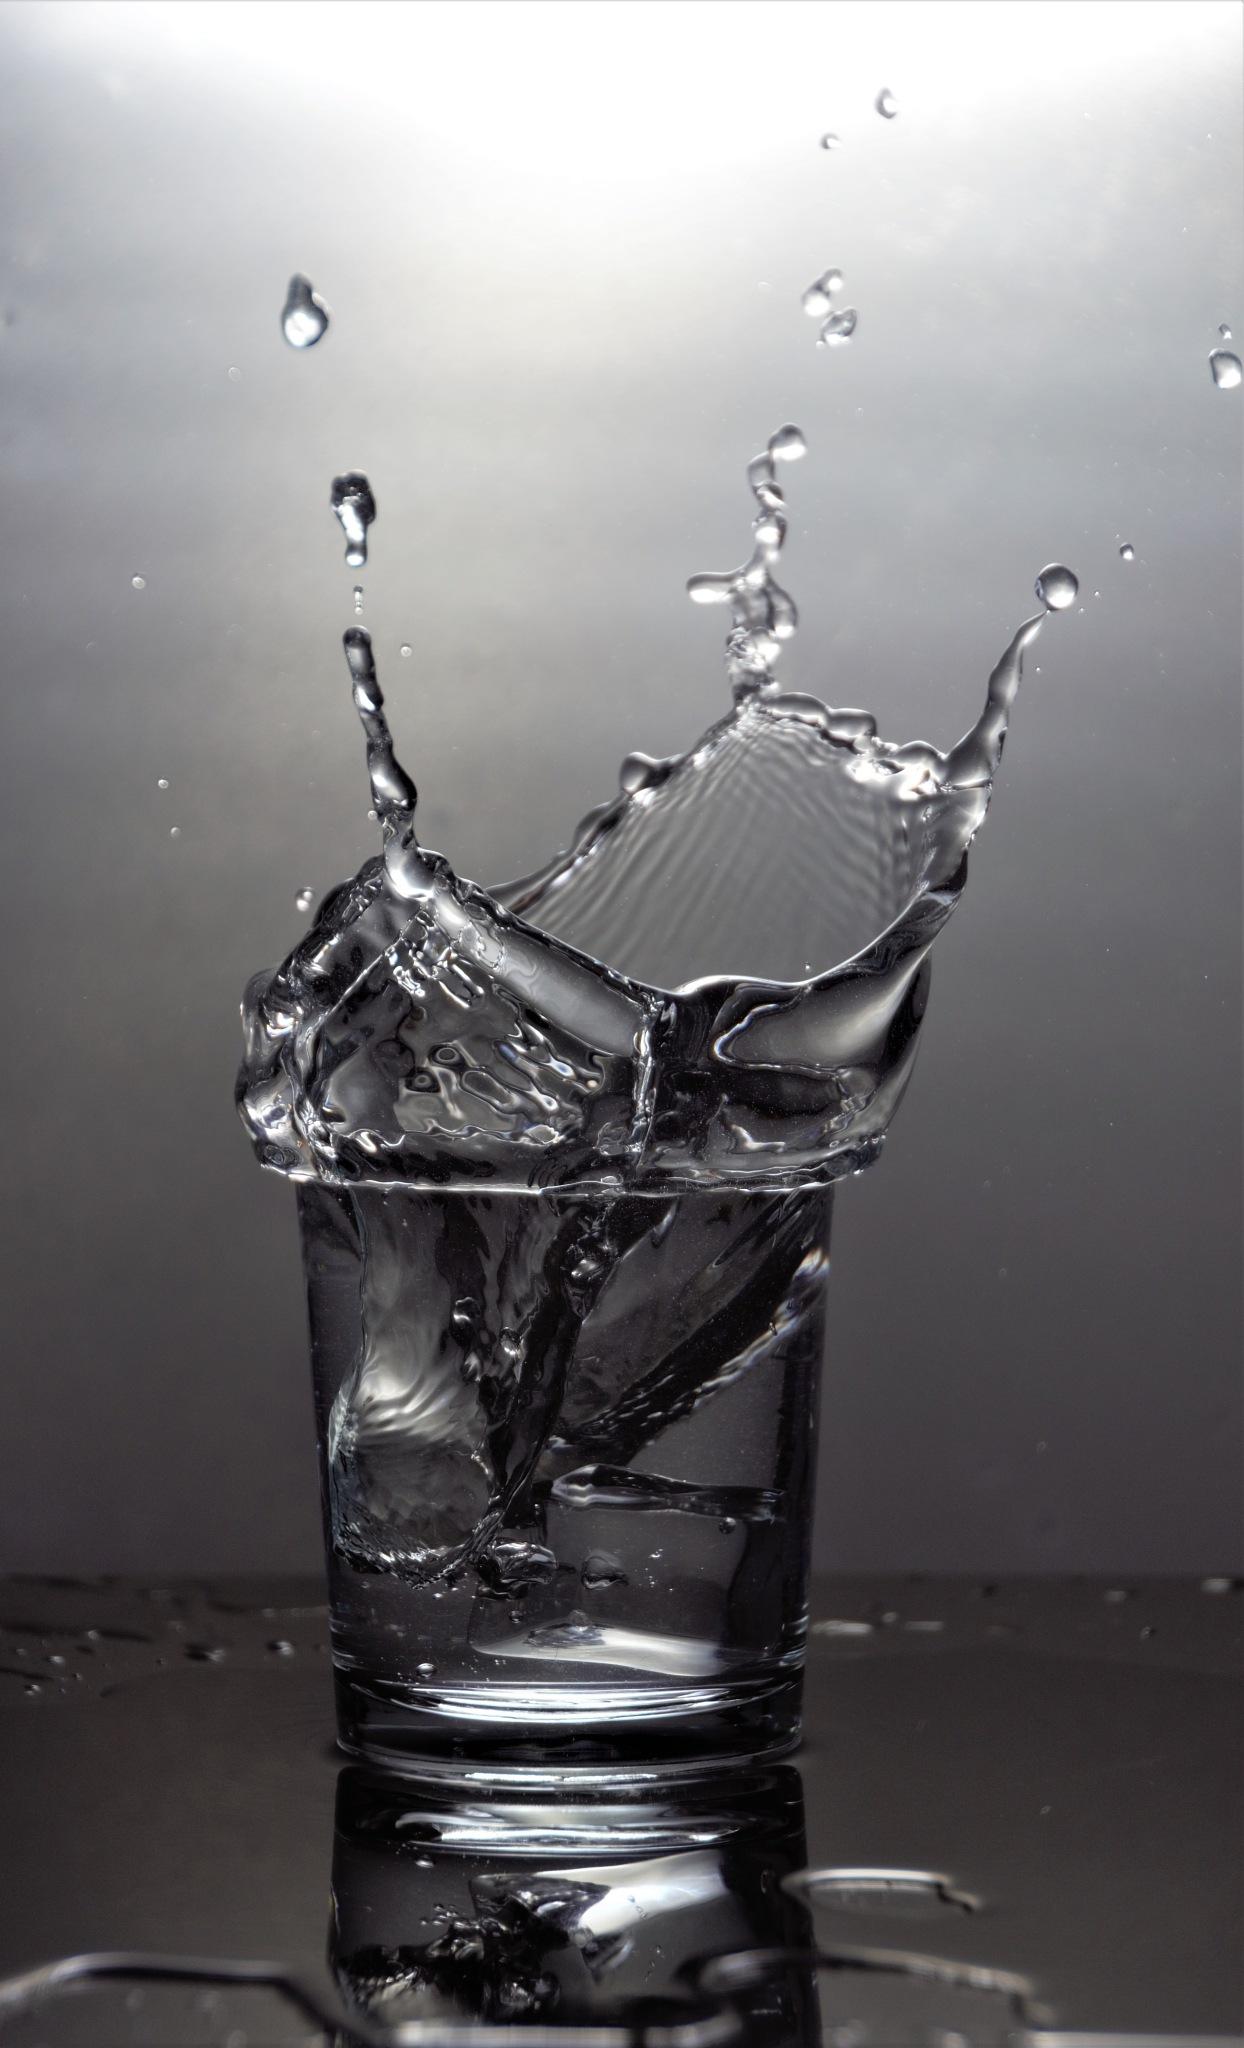 Braking the water  by Hugh Burden